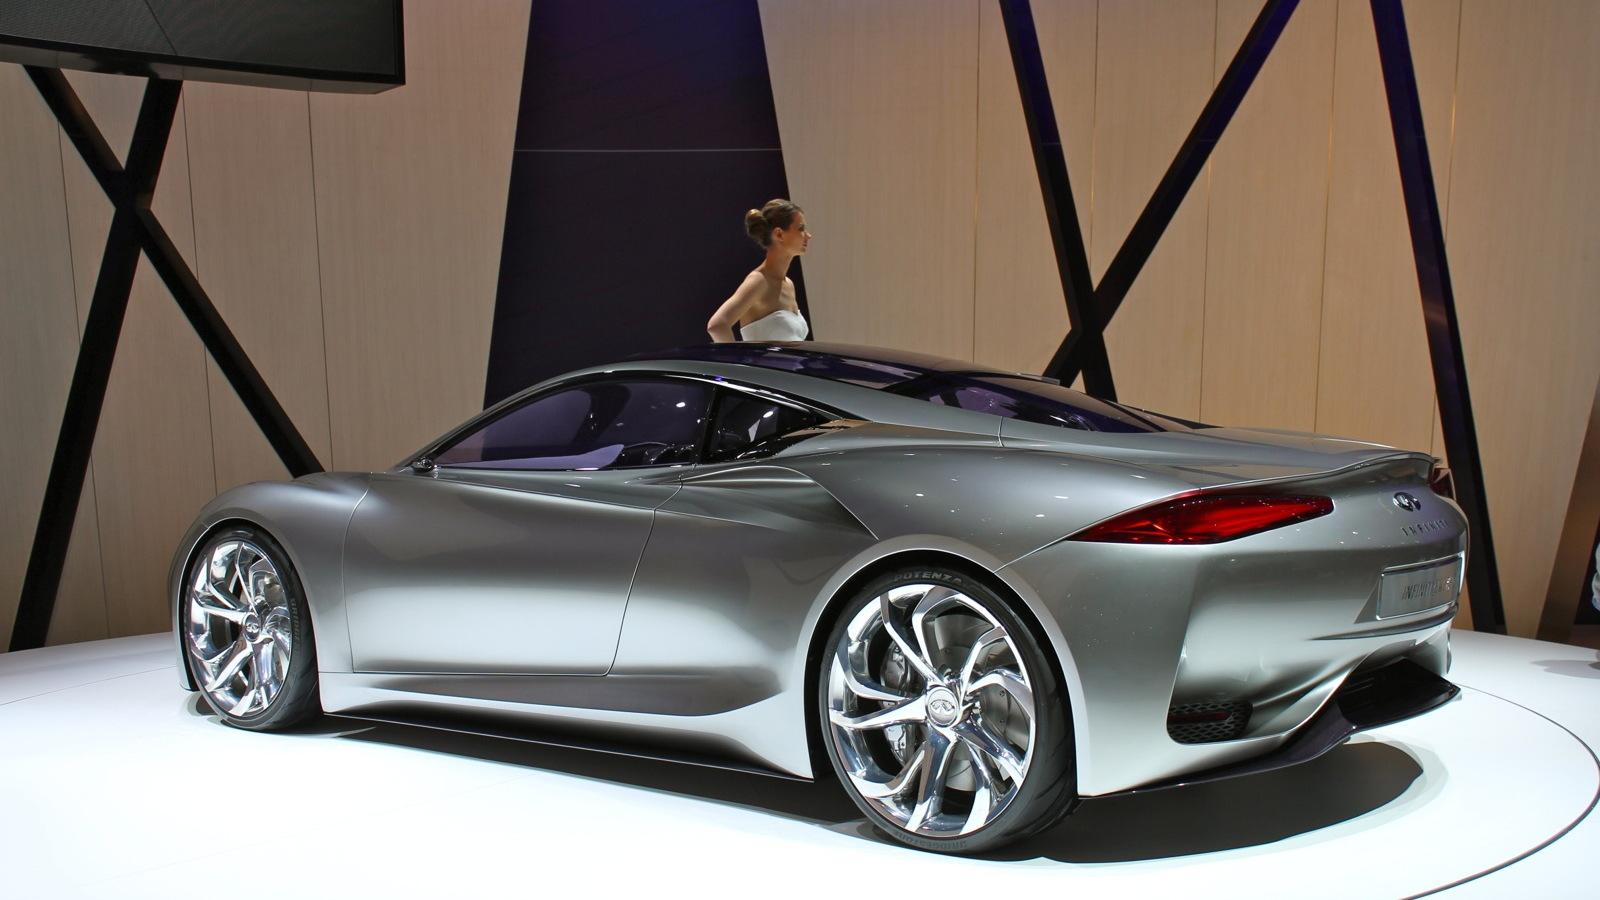 2012 Infiniti Emerg-E concept